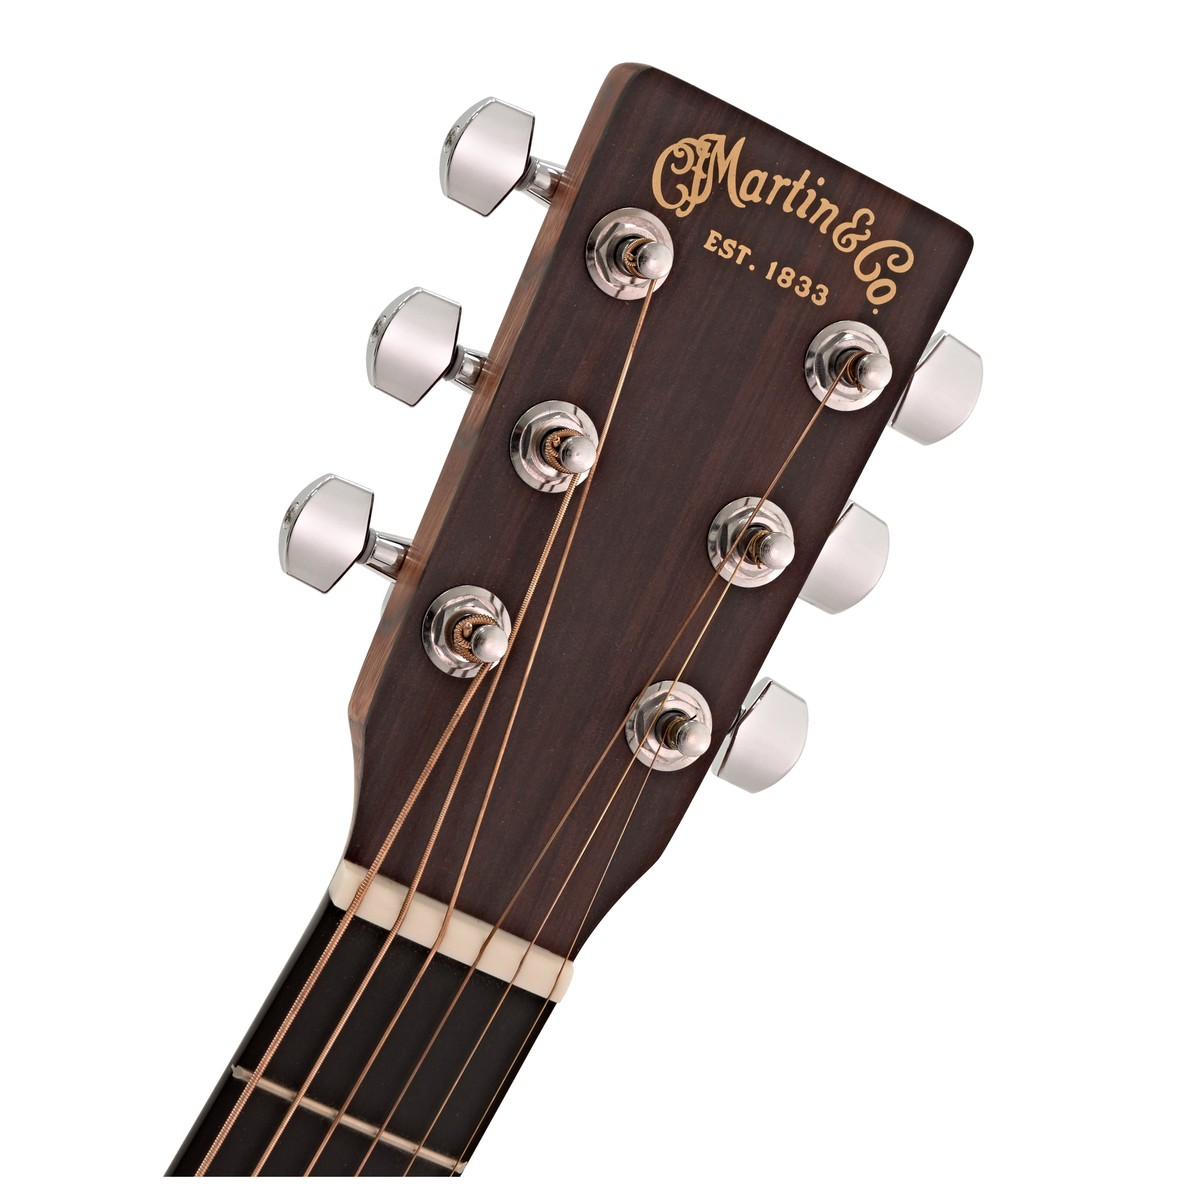 martin lxme little martin guitar at gear4music. Black Bedroom Furniture Sets. Home Design Ideas